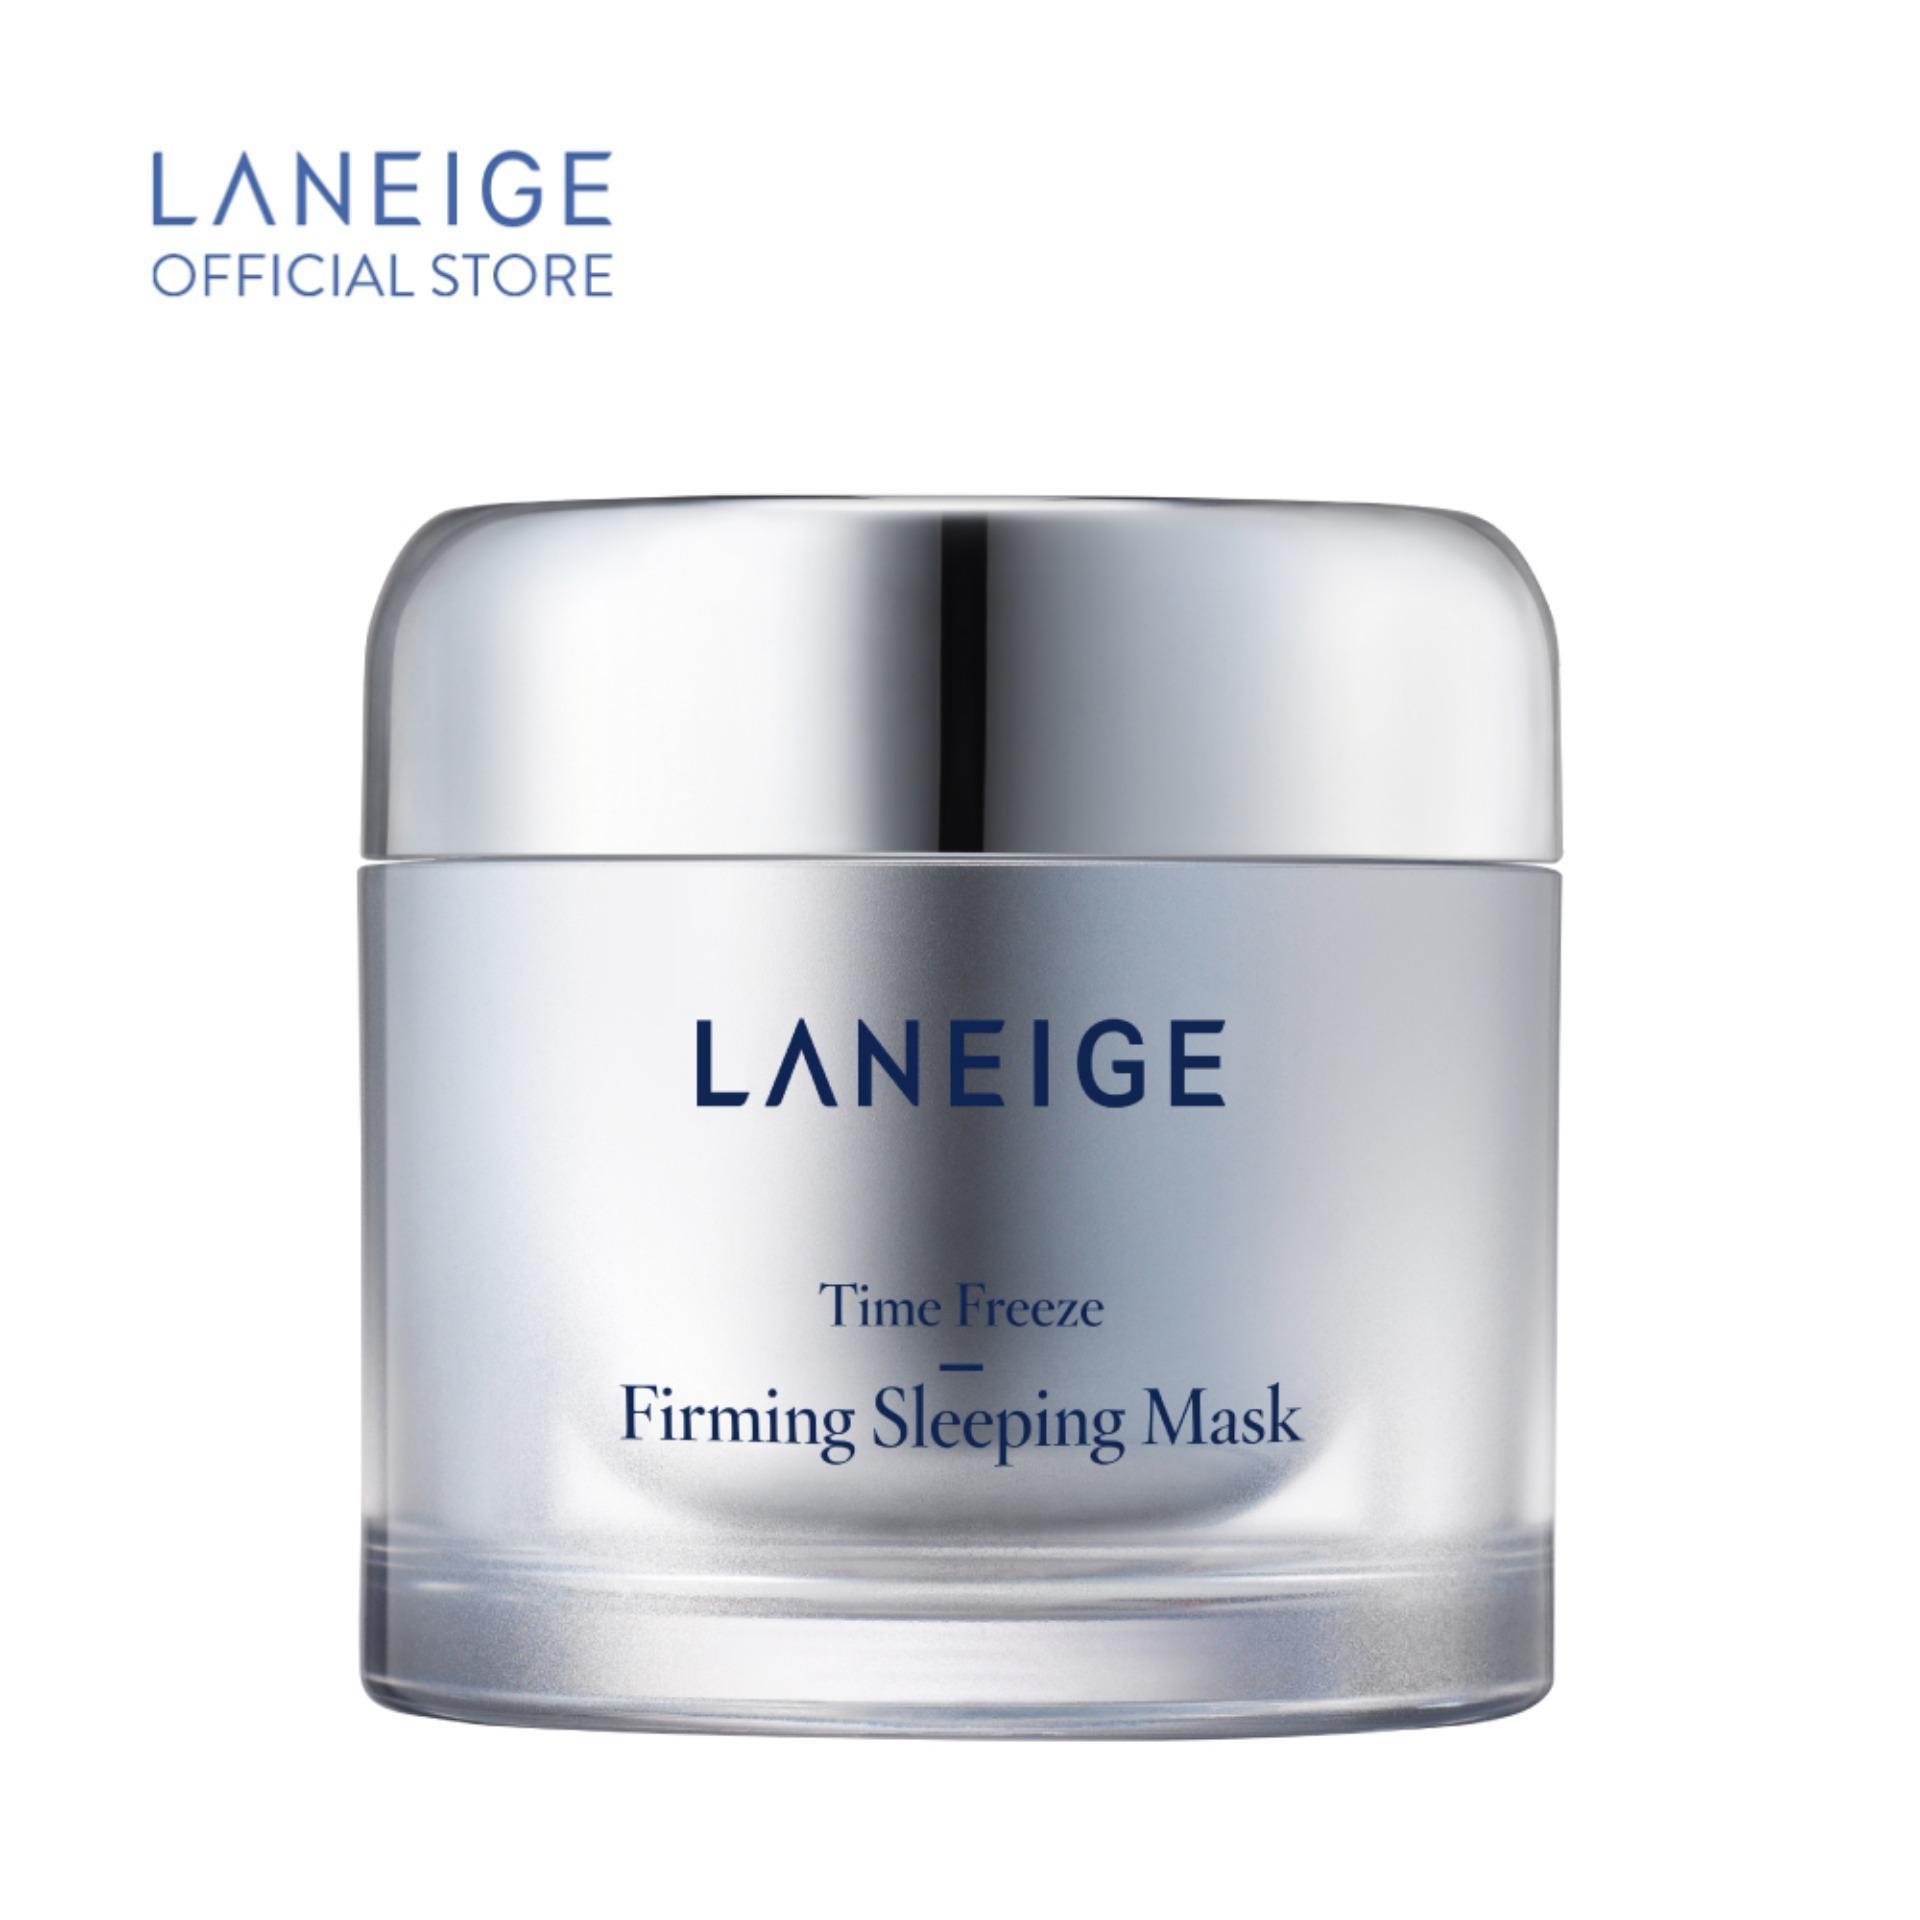 Mặt Nạ Ngủ Ngăn Ngừa Lão Hóa Laneige Time Freeze Firming Sleeping Mask 60Ml